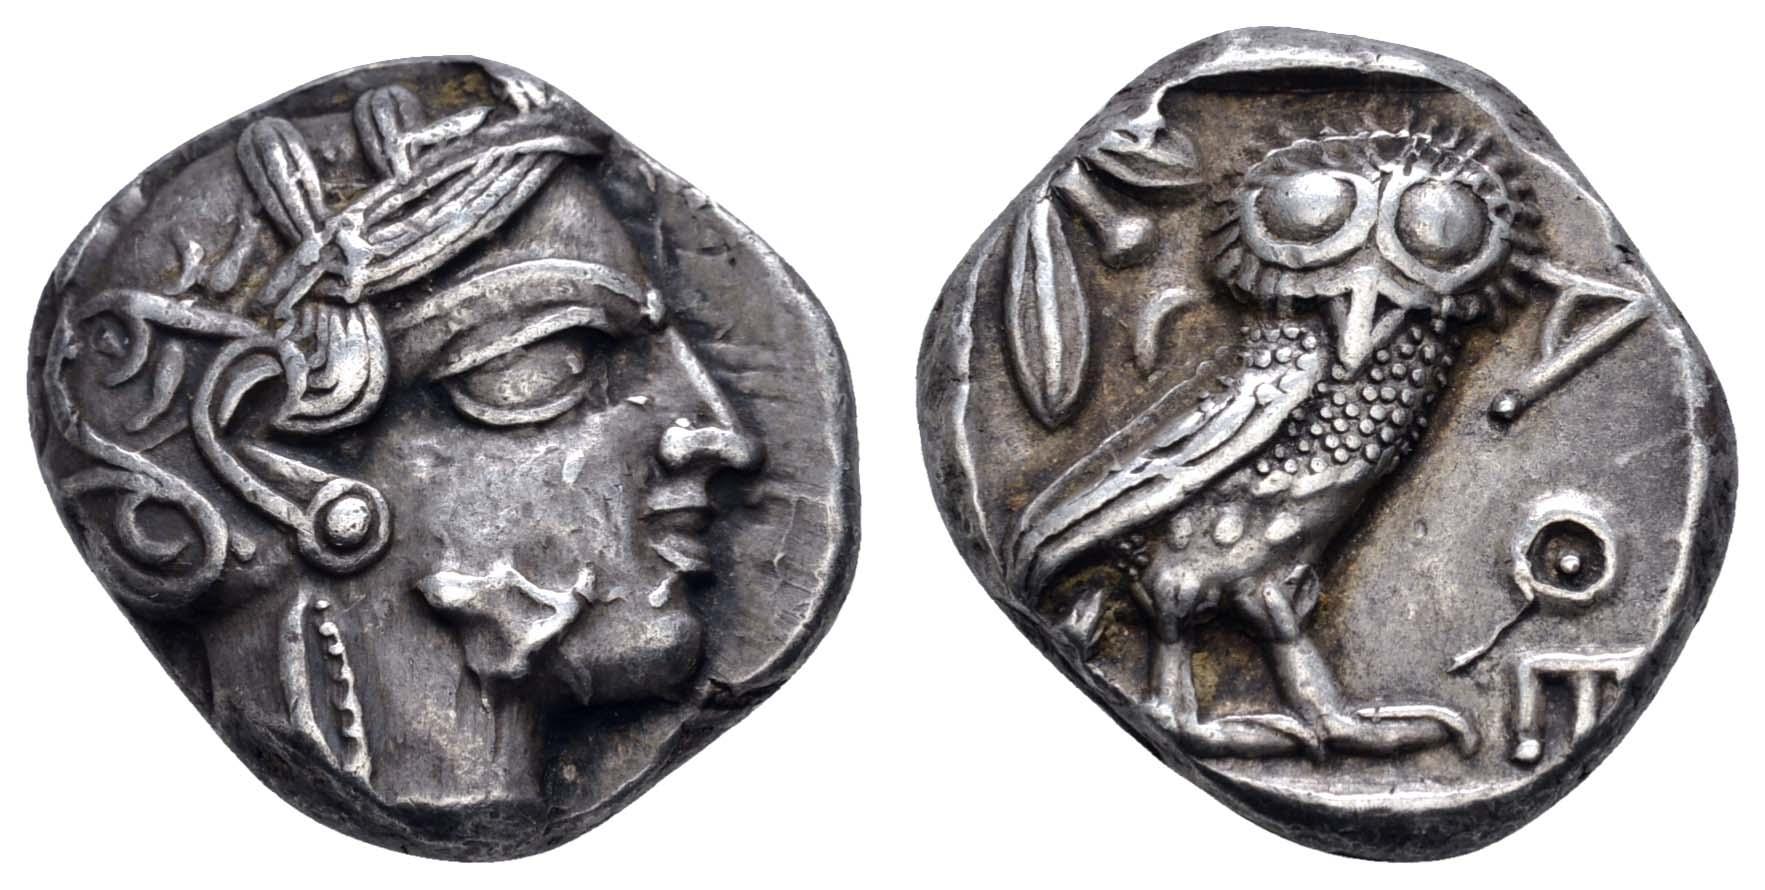 Lot 33 - Antike Griechen - Attika -  Auktionshaus Ulrich Felzmann GmbH & Co. KG Coins single lots